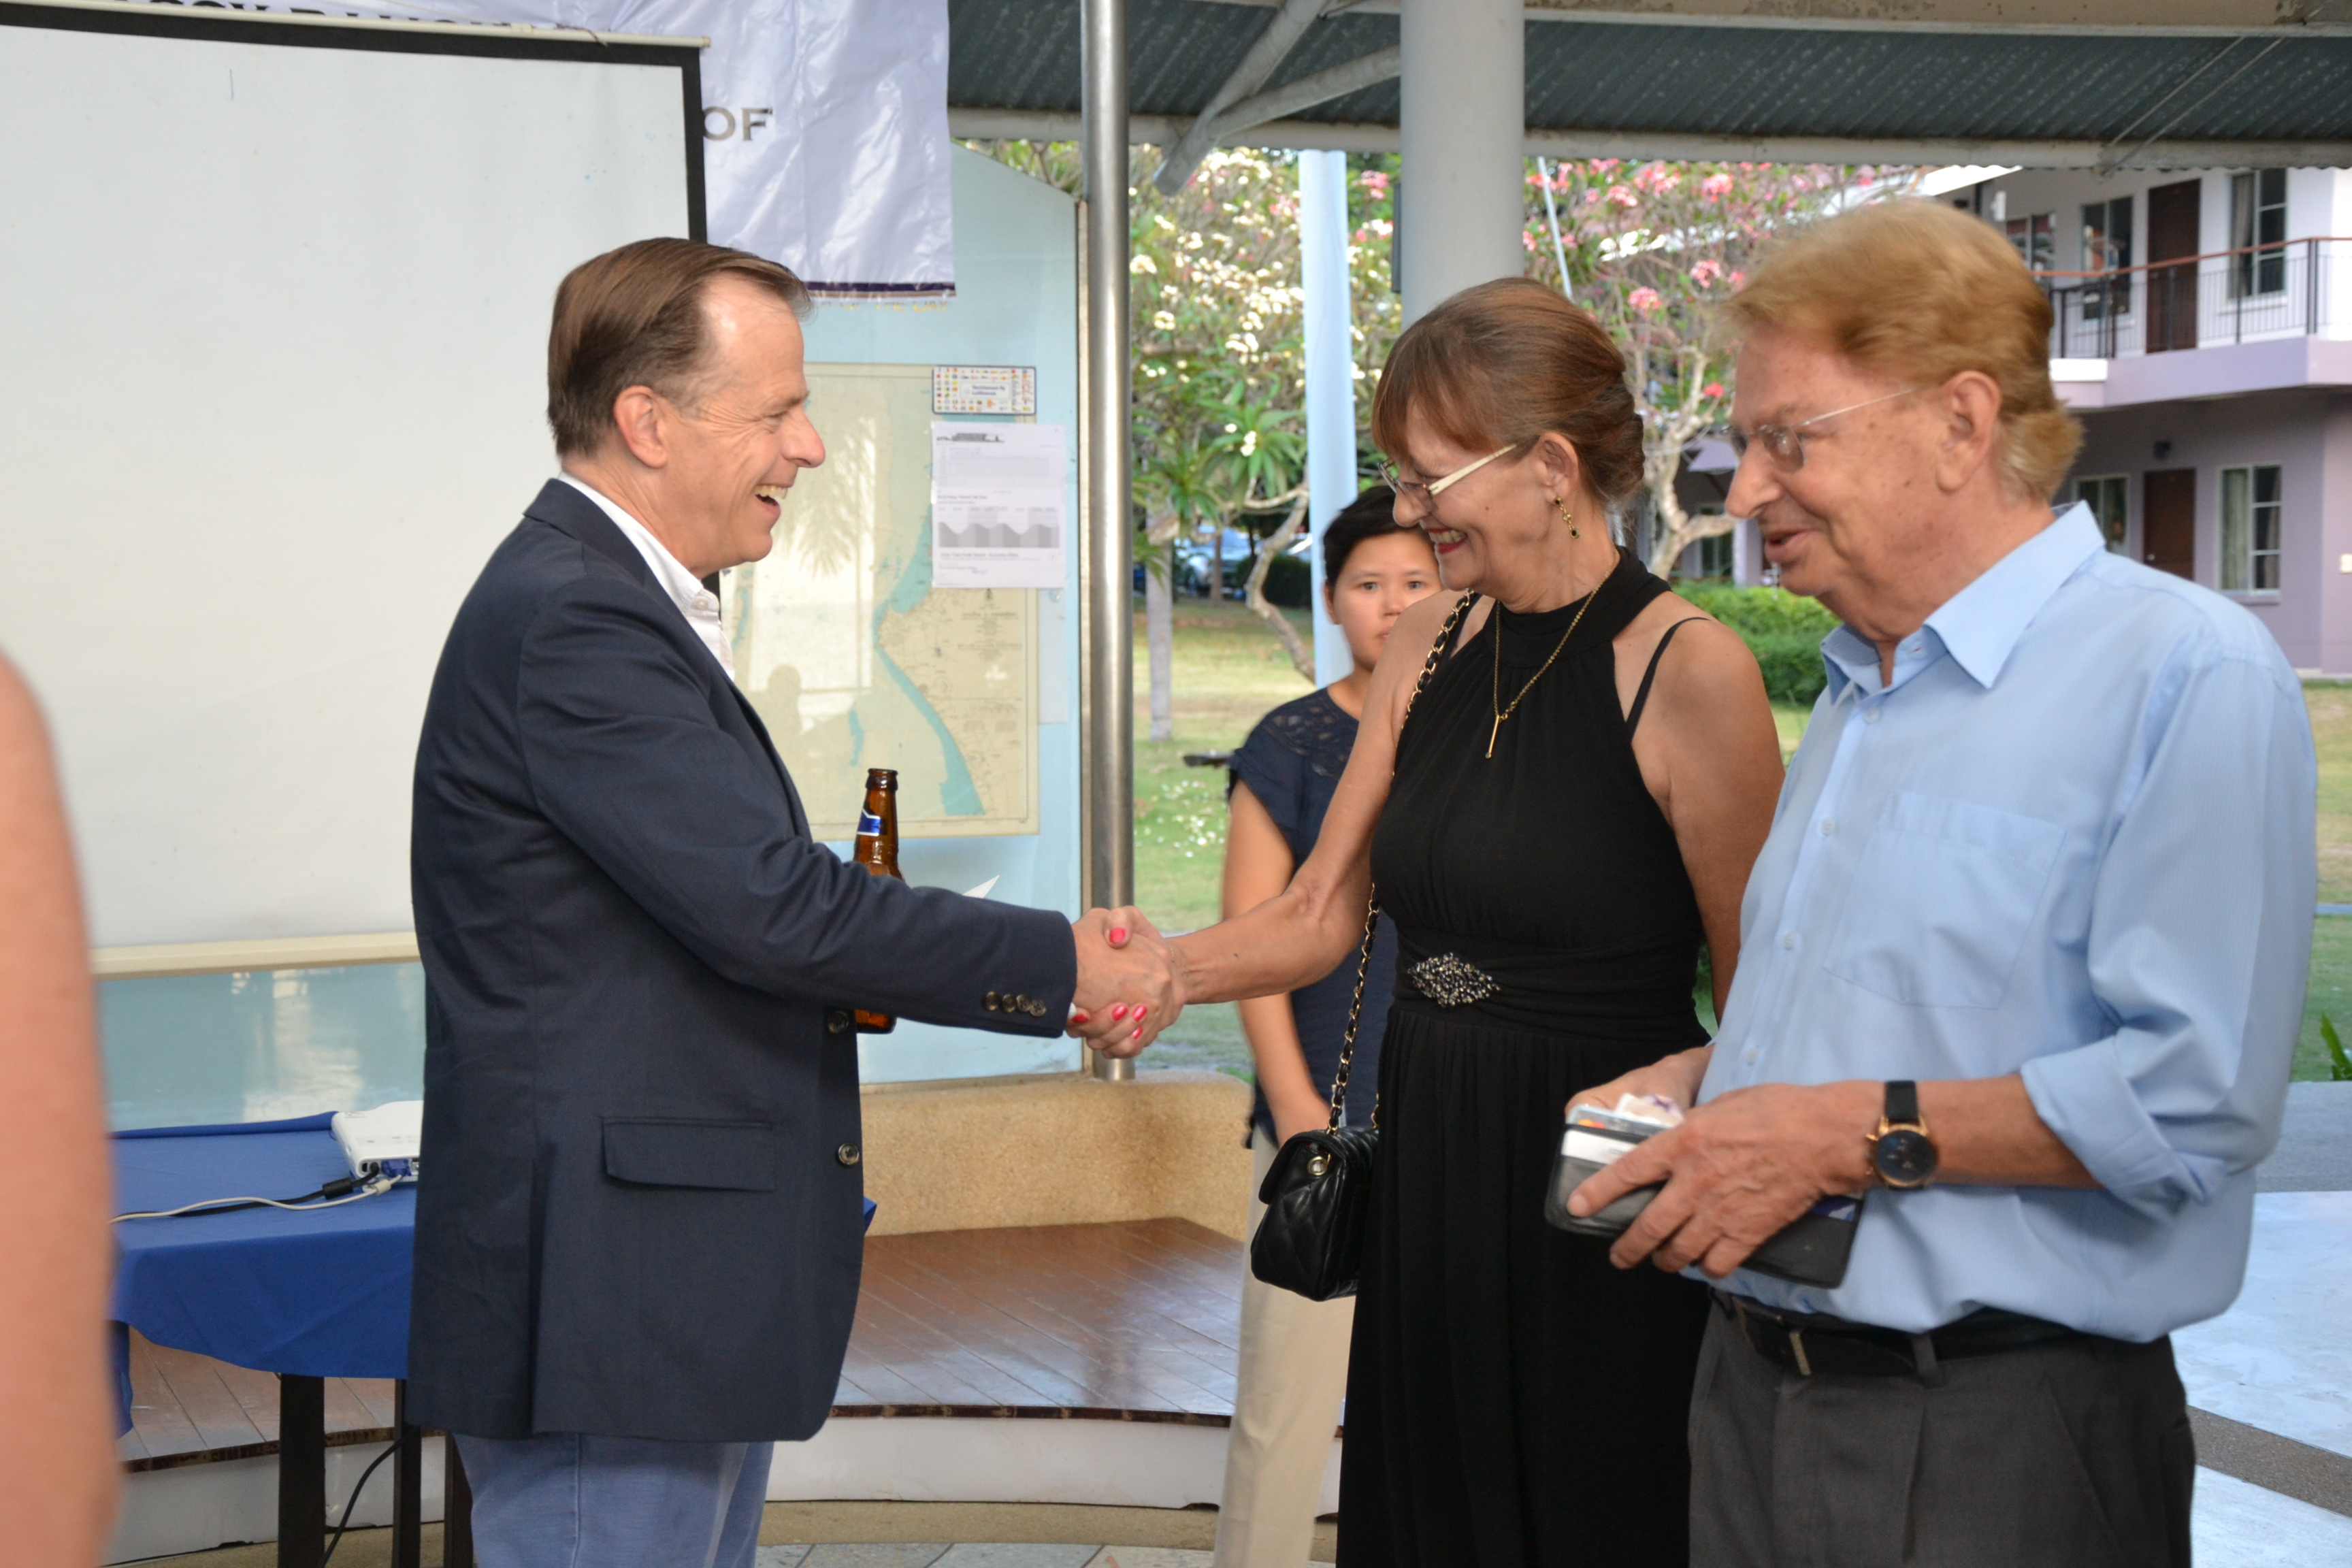 Ambassador Davies welcomes Princess Iris of Saxony and Hans Mueller.